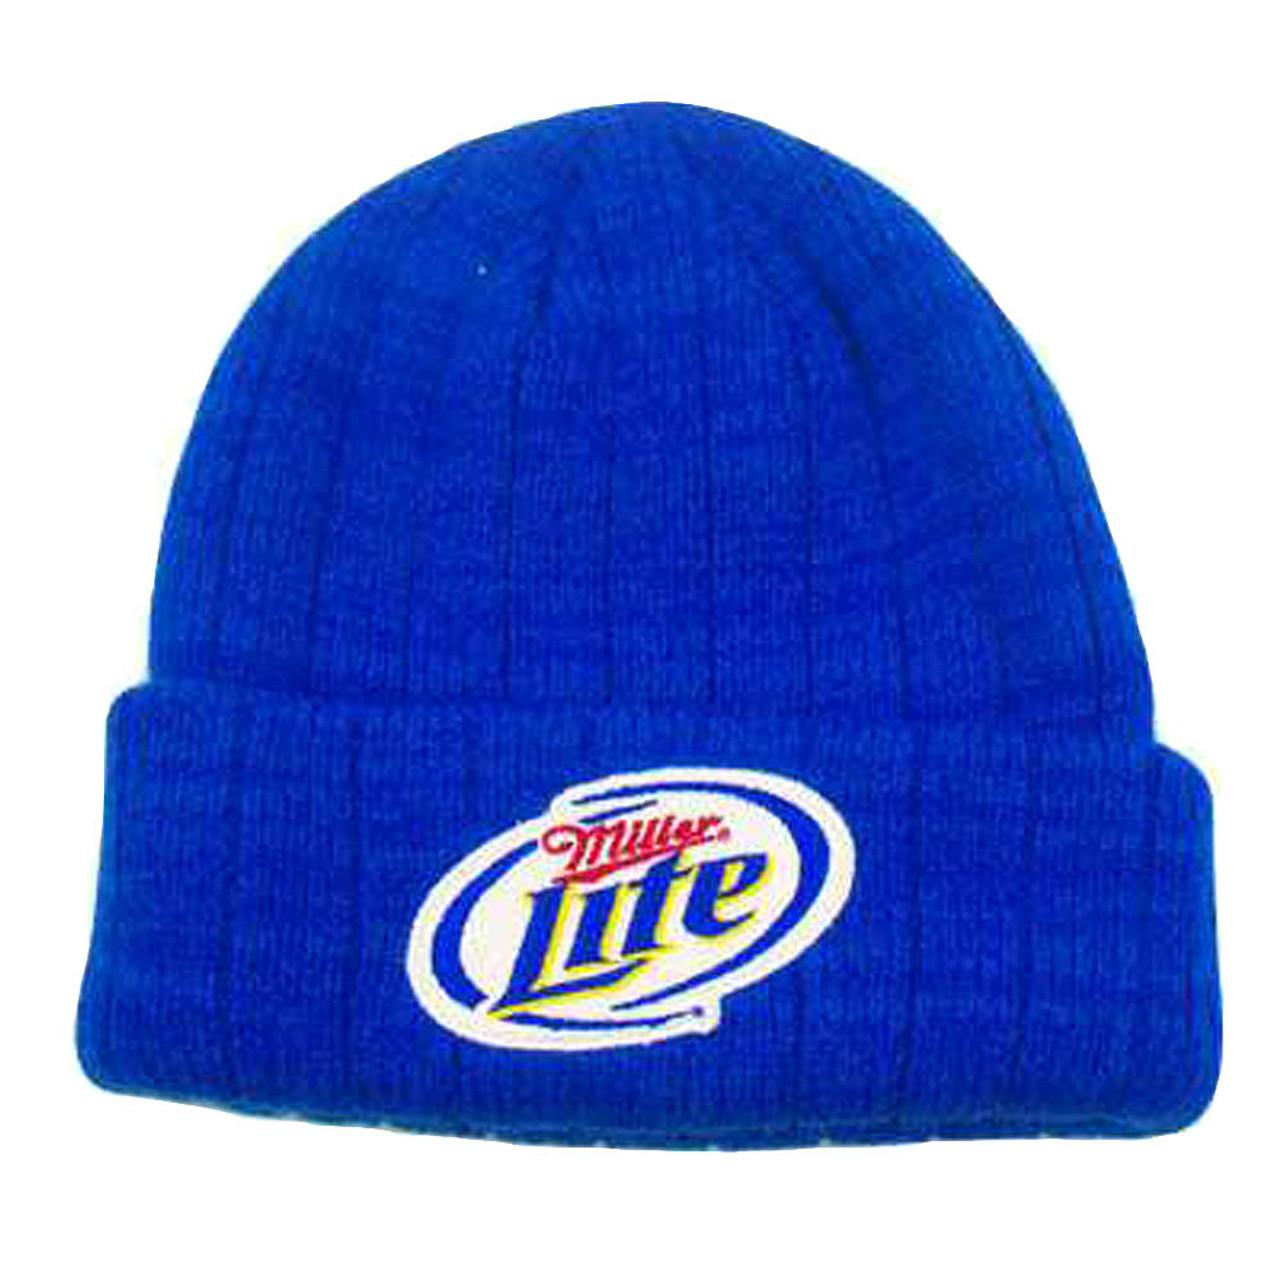 8d1a7f97ba718 MILLER LITE CERVEZA BEER BLUE BEANIE SKULLY KNIT HAT - Cap Store Online.com